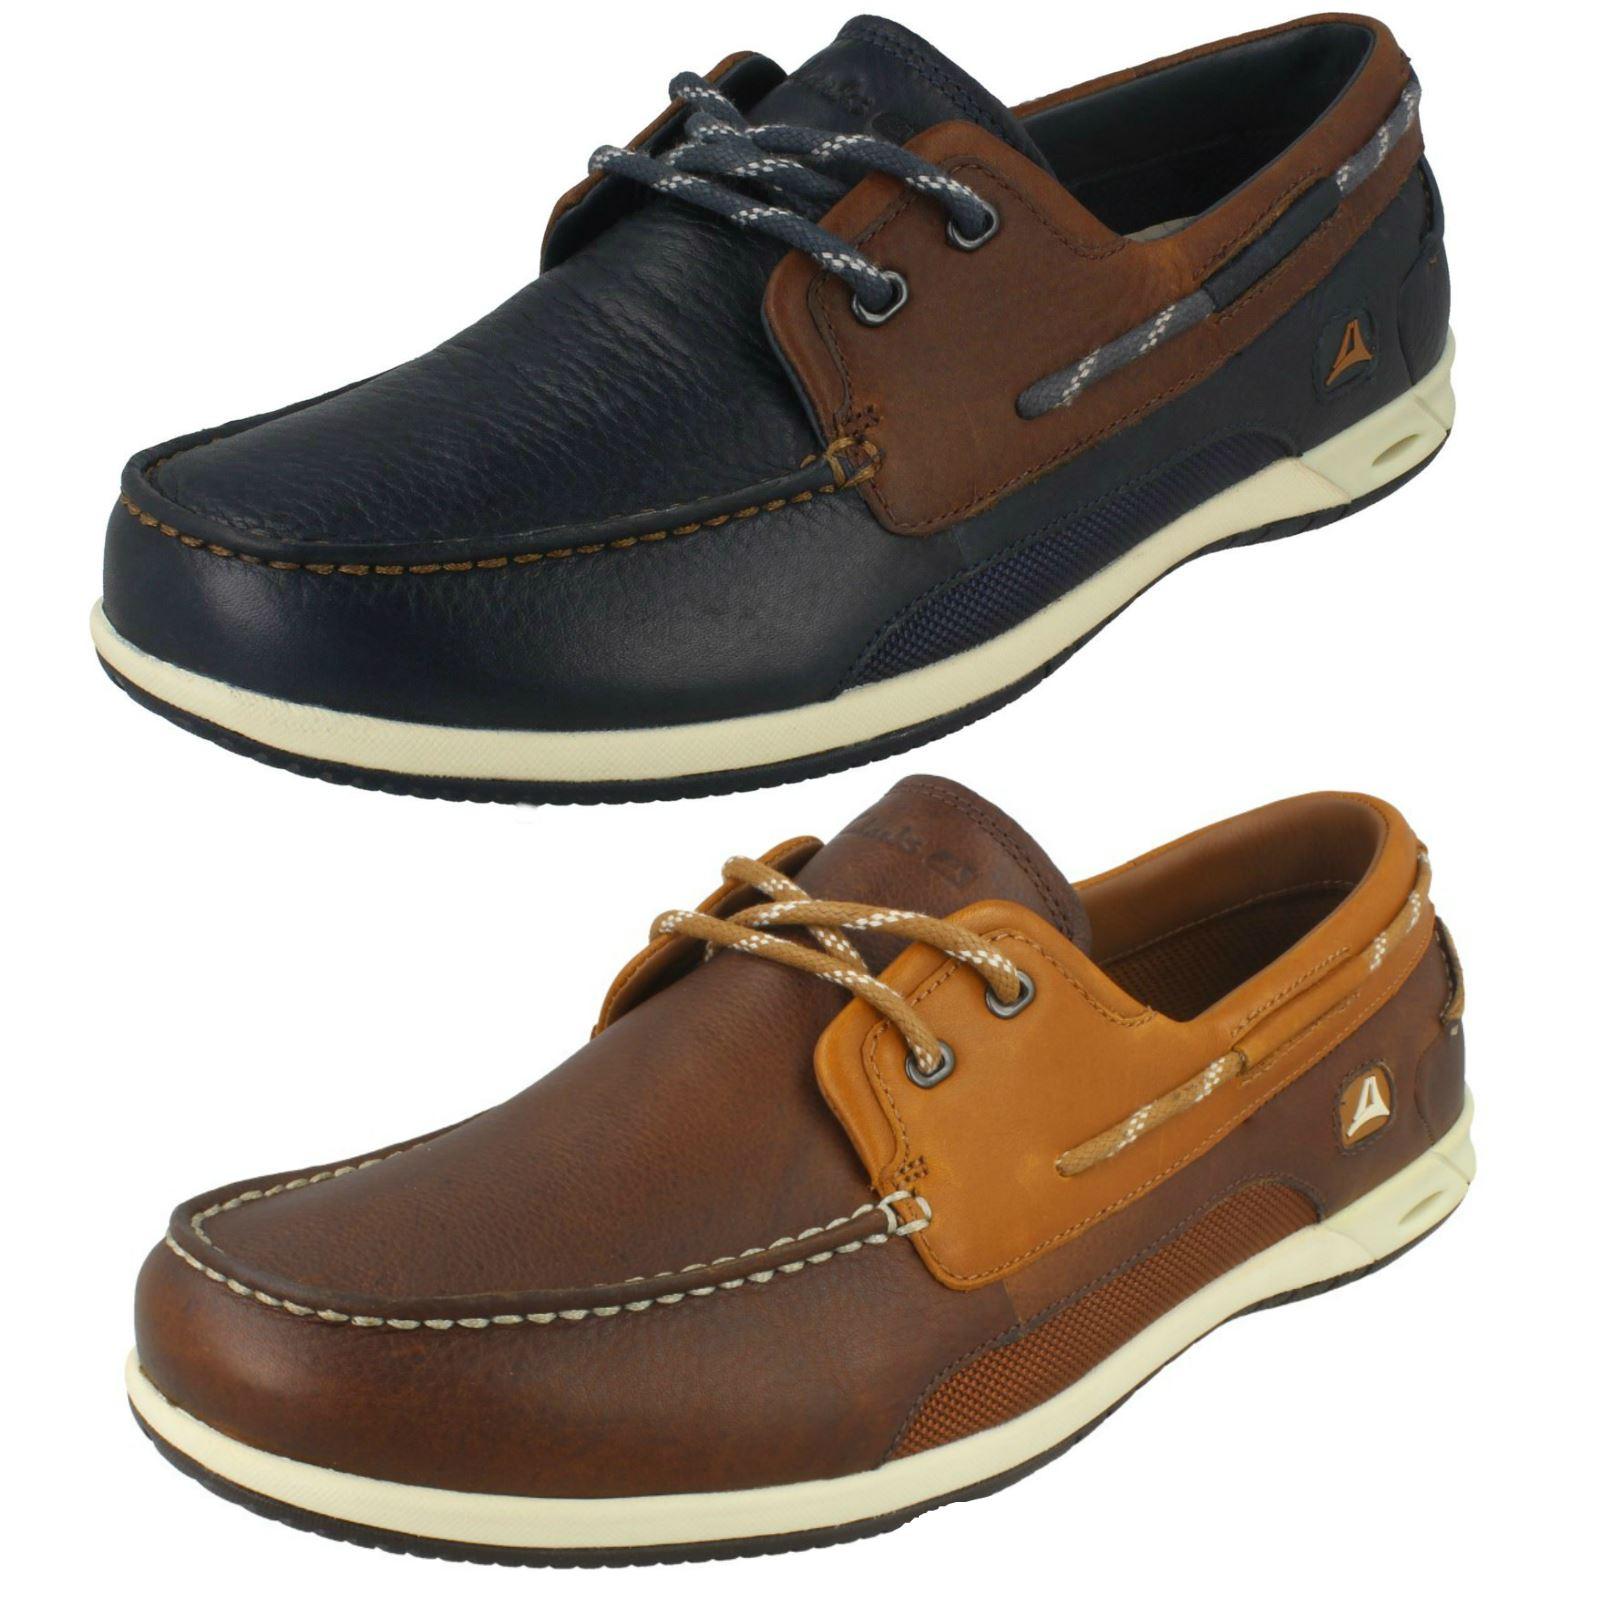 Detalles de Hombre Clarks Zapatos Náuticos Orson Puerto